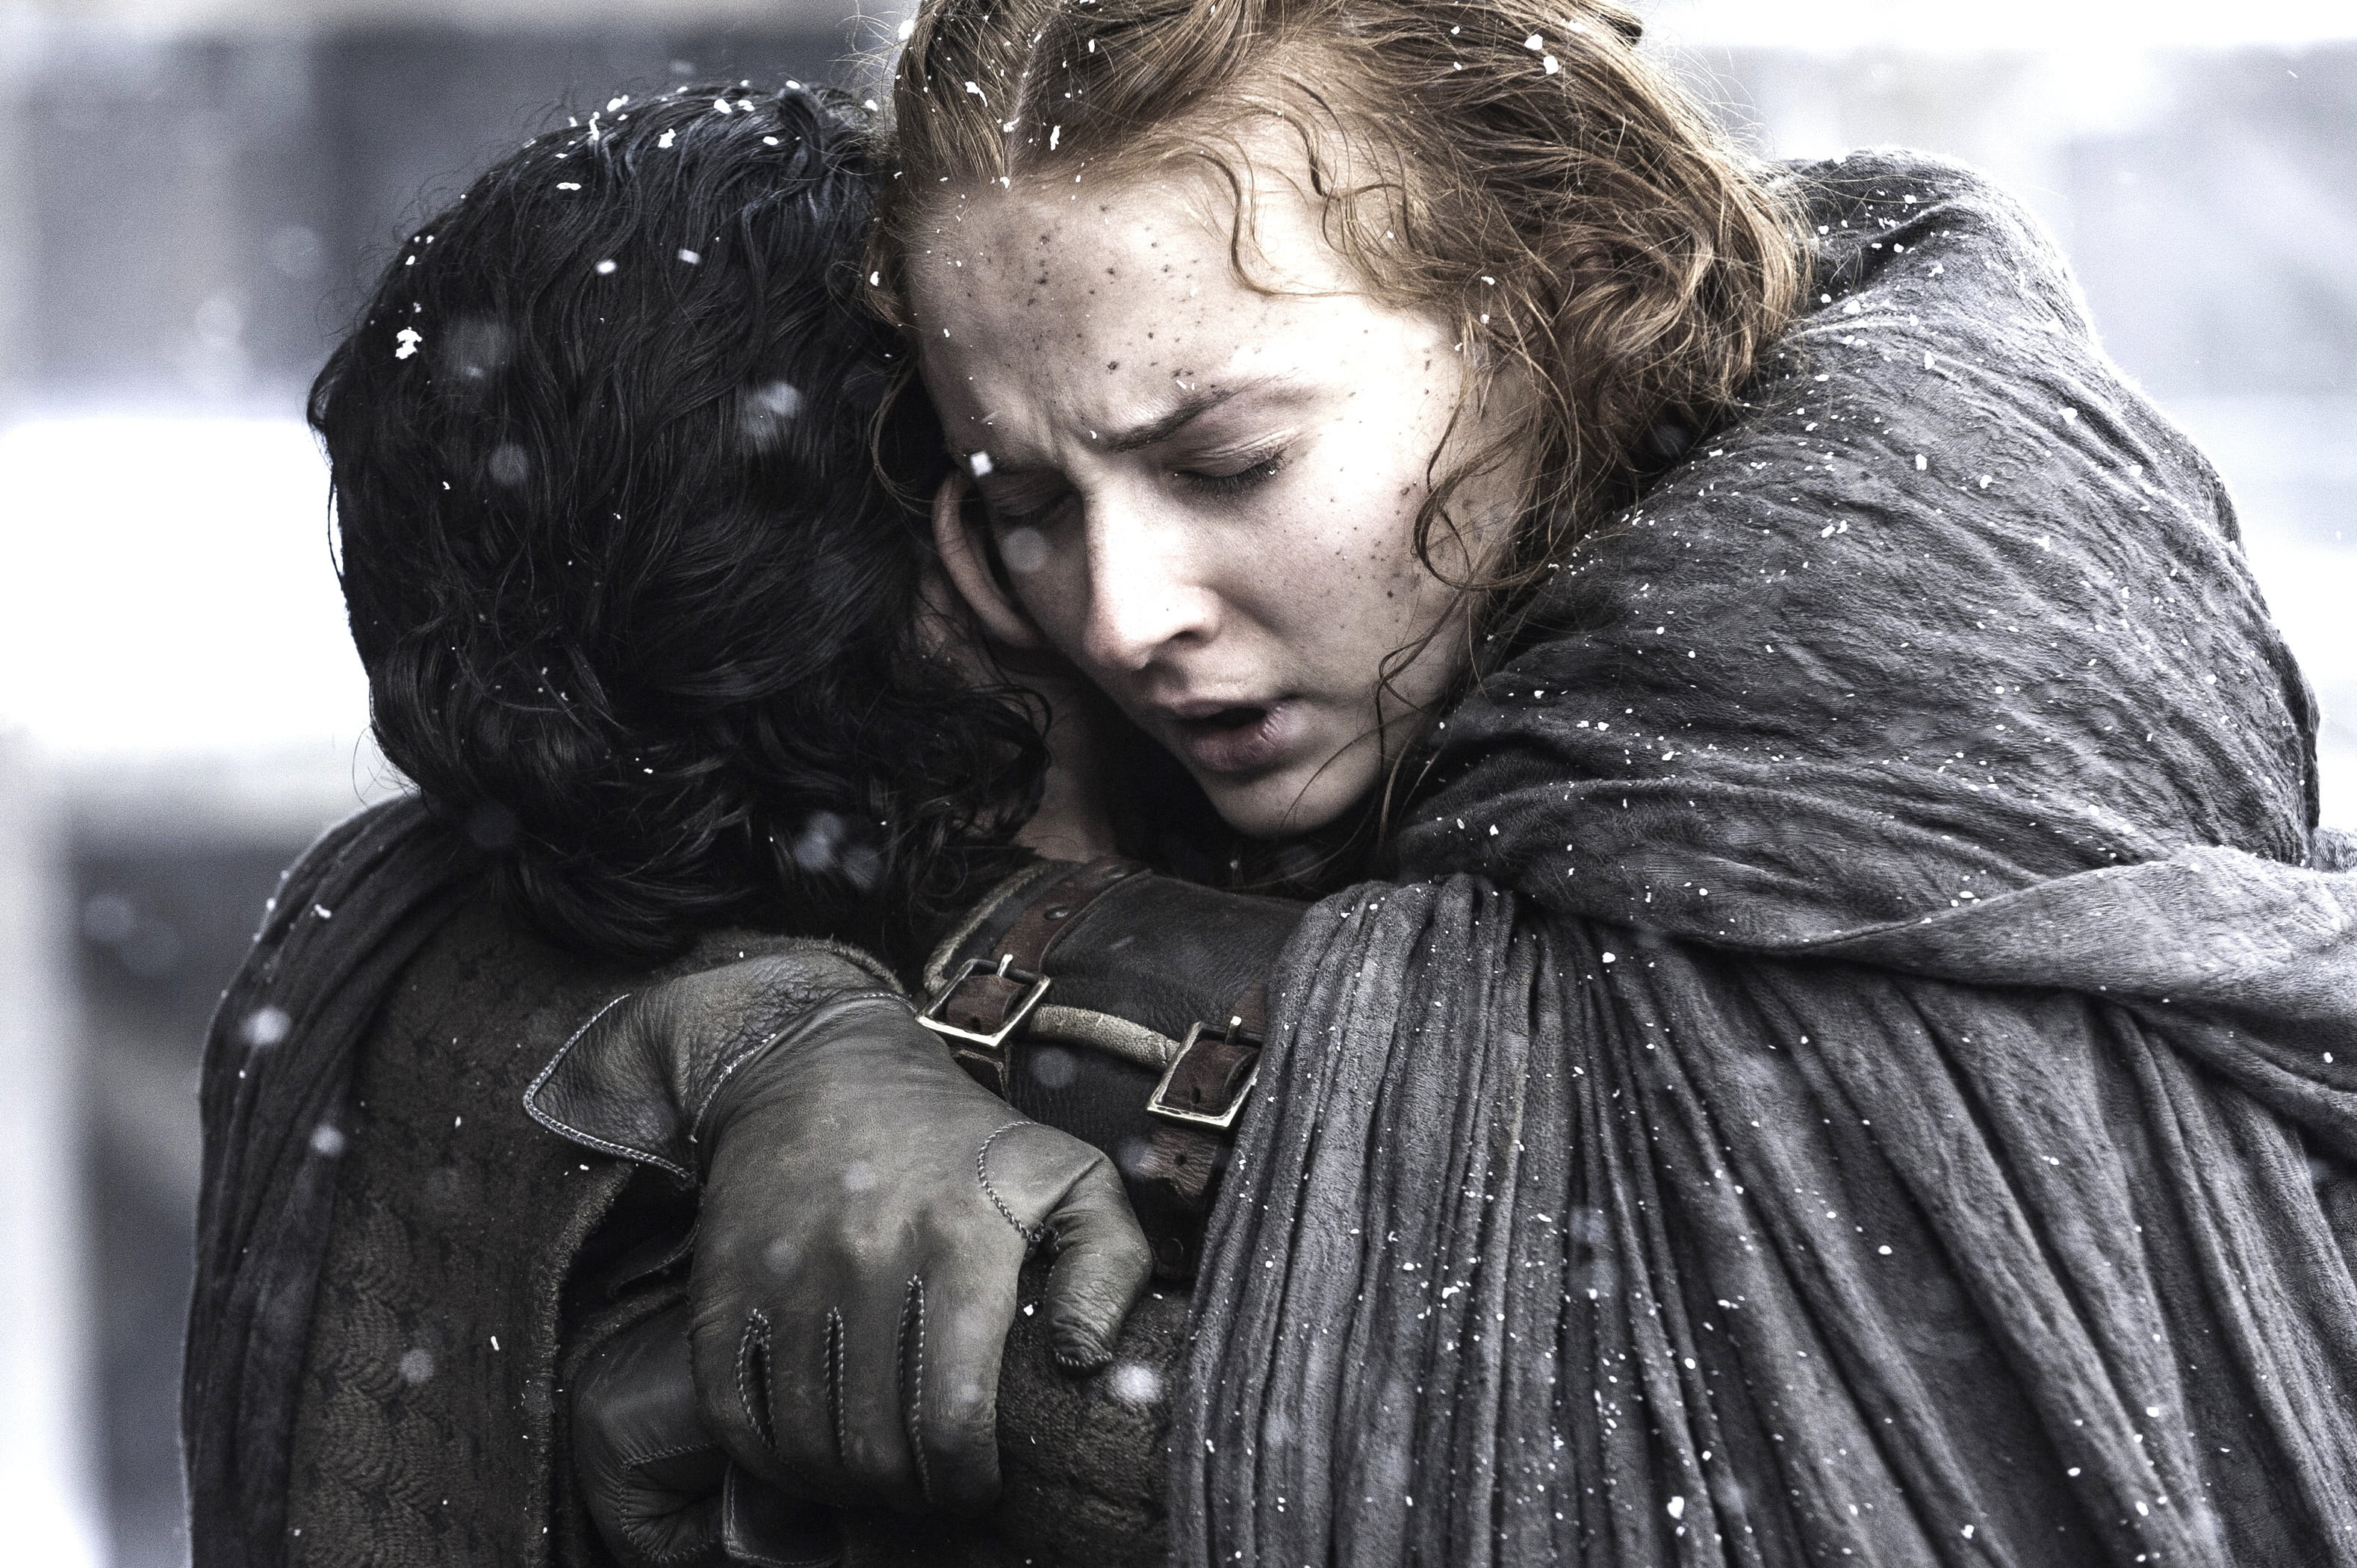 Res: 3156x2100, Arya Stark and Jon Snow HD wallpaper